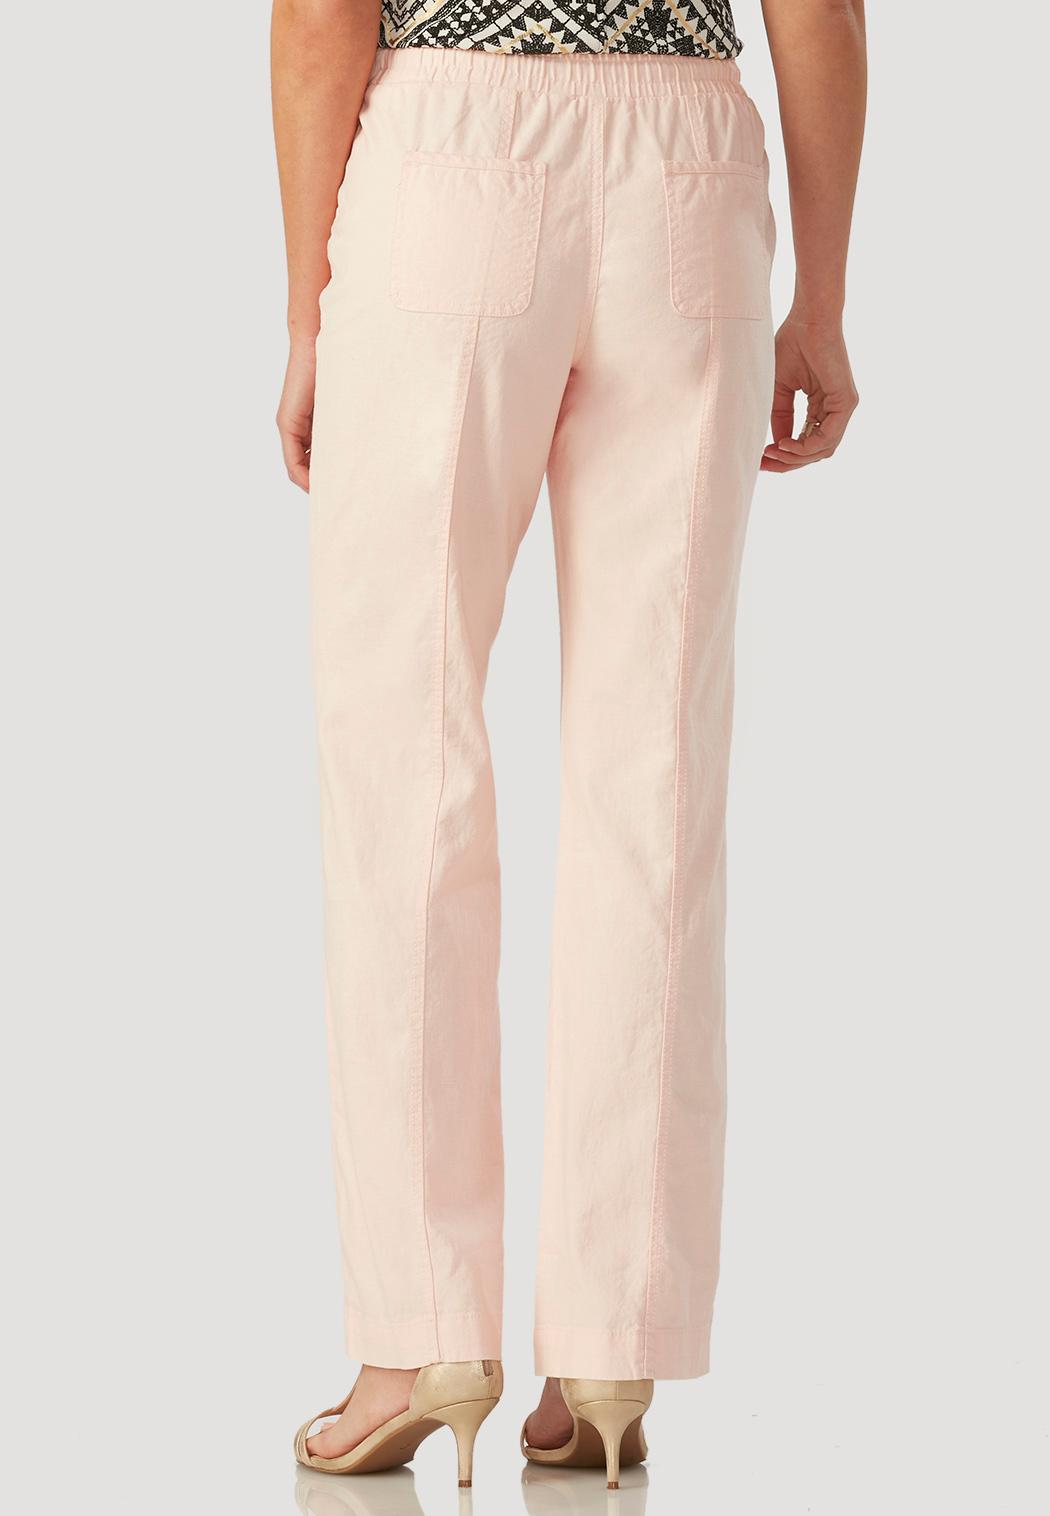 Linen pants – the best summer wear for men